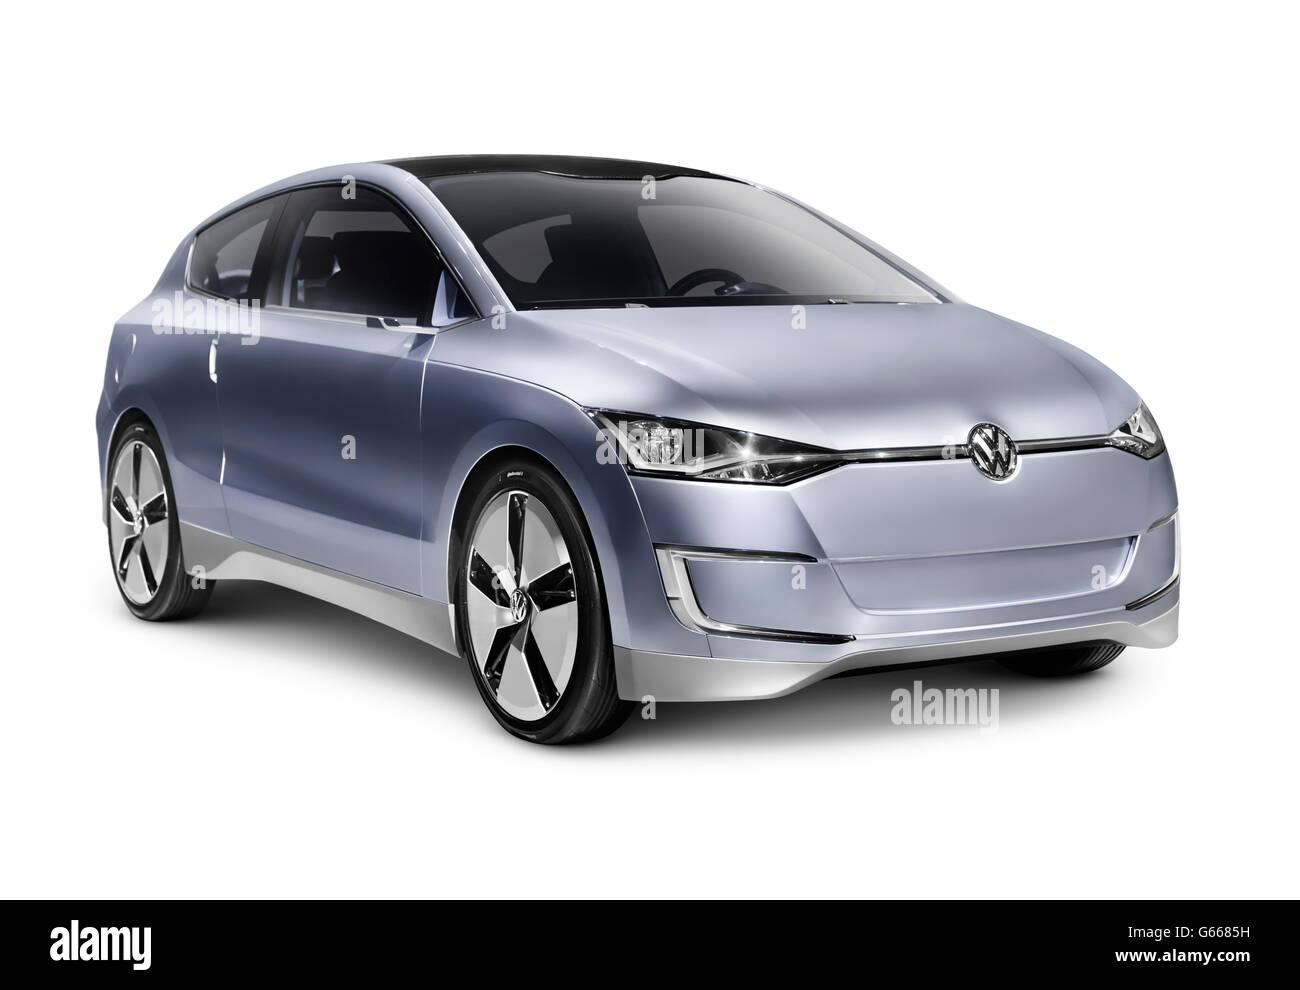 2010 Volkswagen Up! Lite Concept hybrid diesel fuel efficient city car - Stock Image